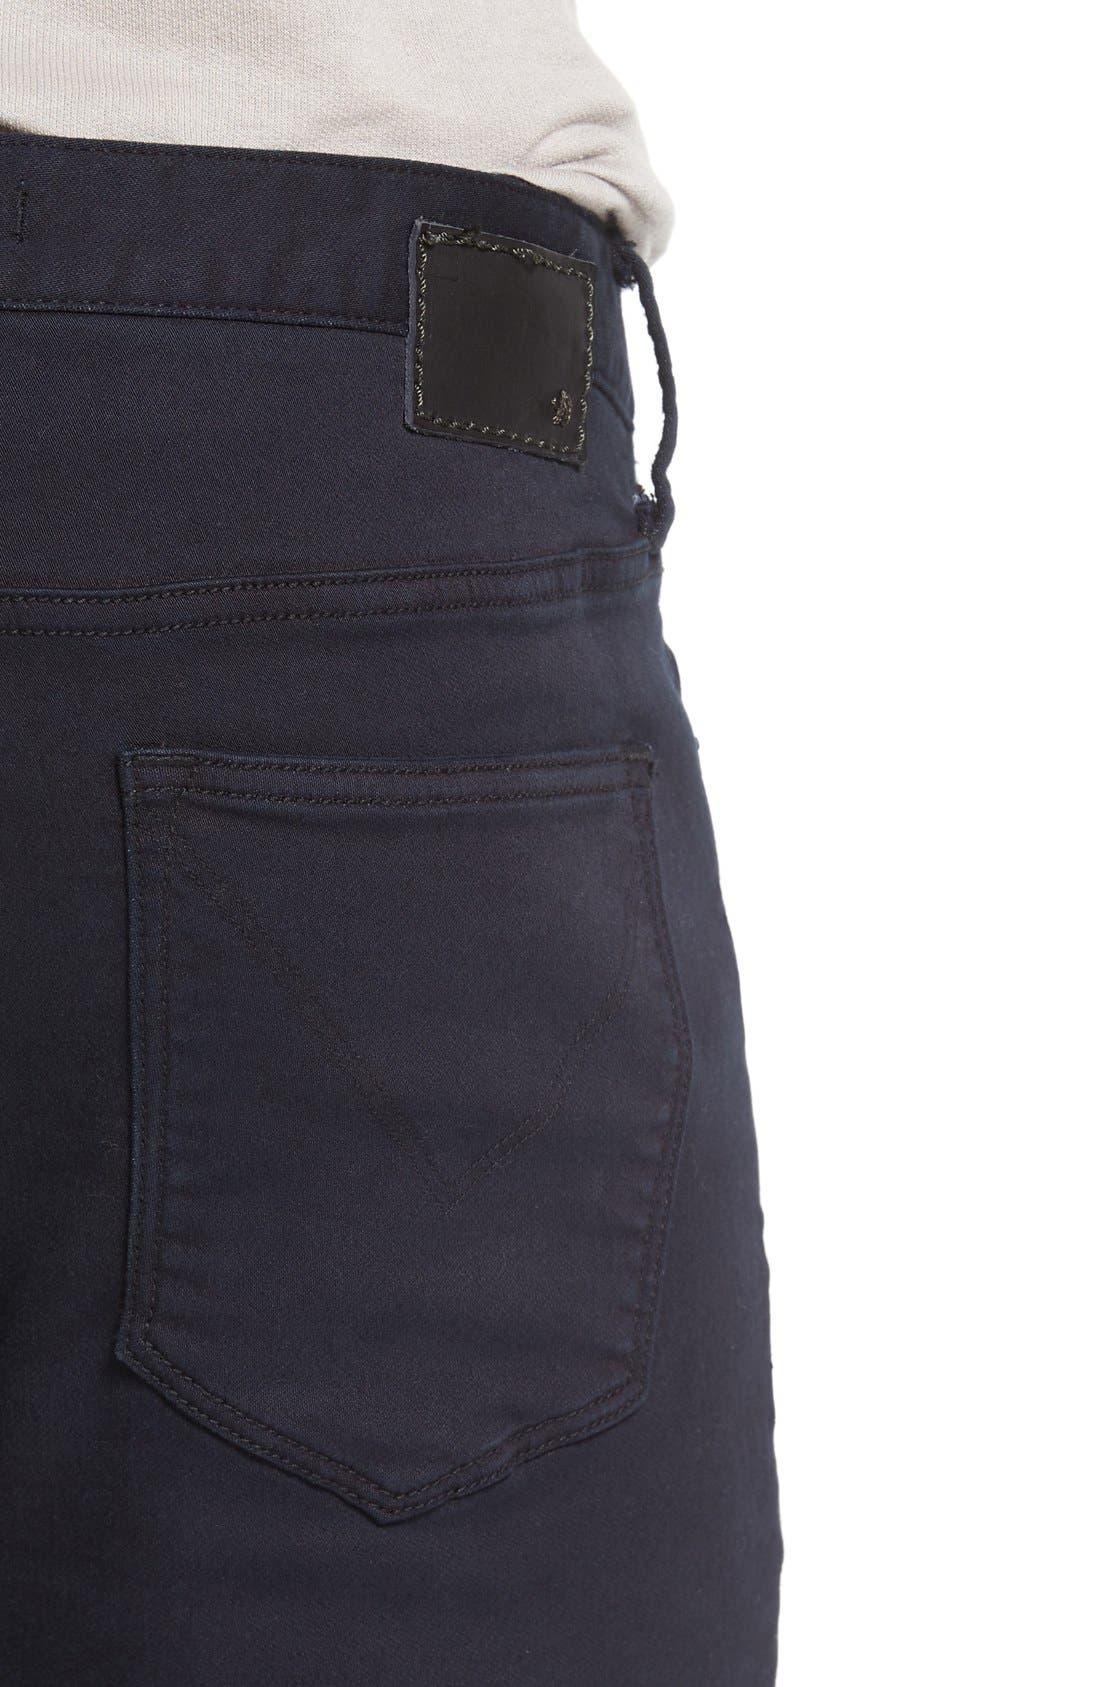 'Bowery' Slim Fit Pants,                             Alternate thumbnail 4, color,                             Eclipse